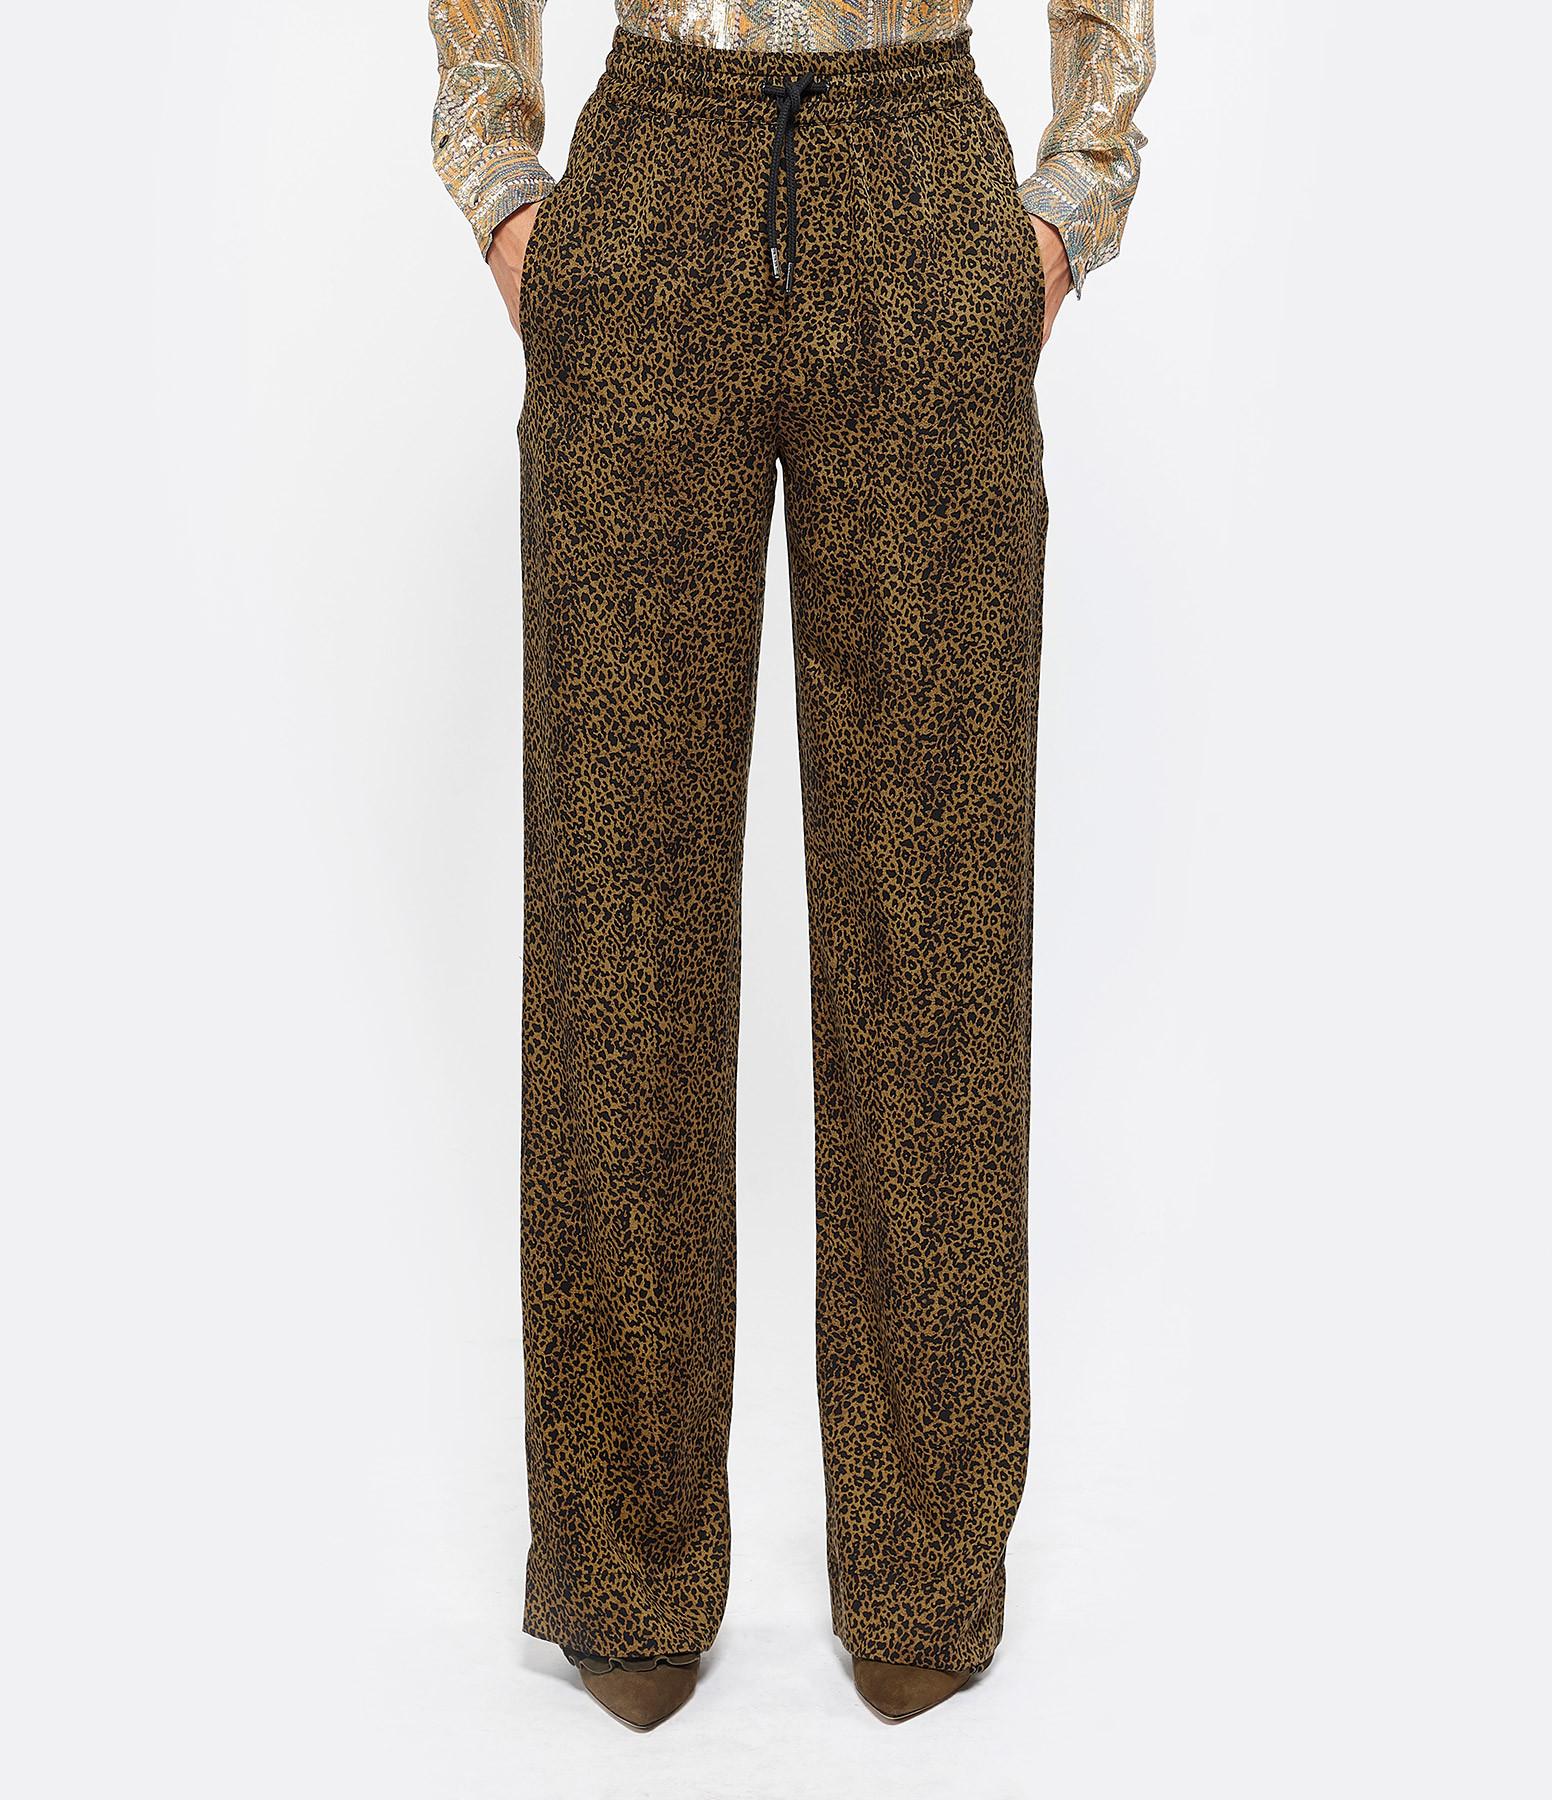 ESSENTIEL ANTWERP - Pantalon Trinity Marron Foret